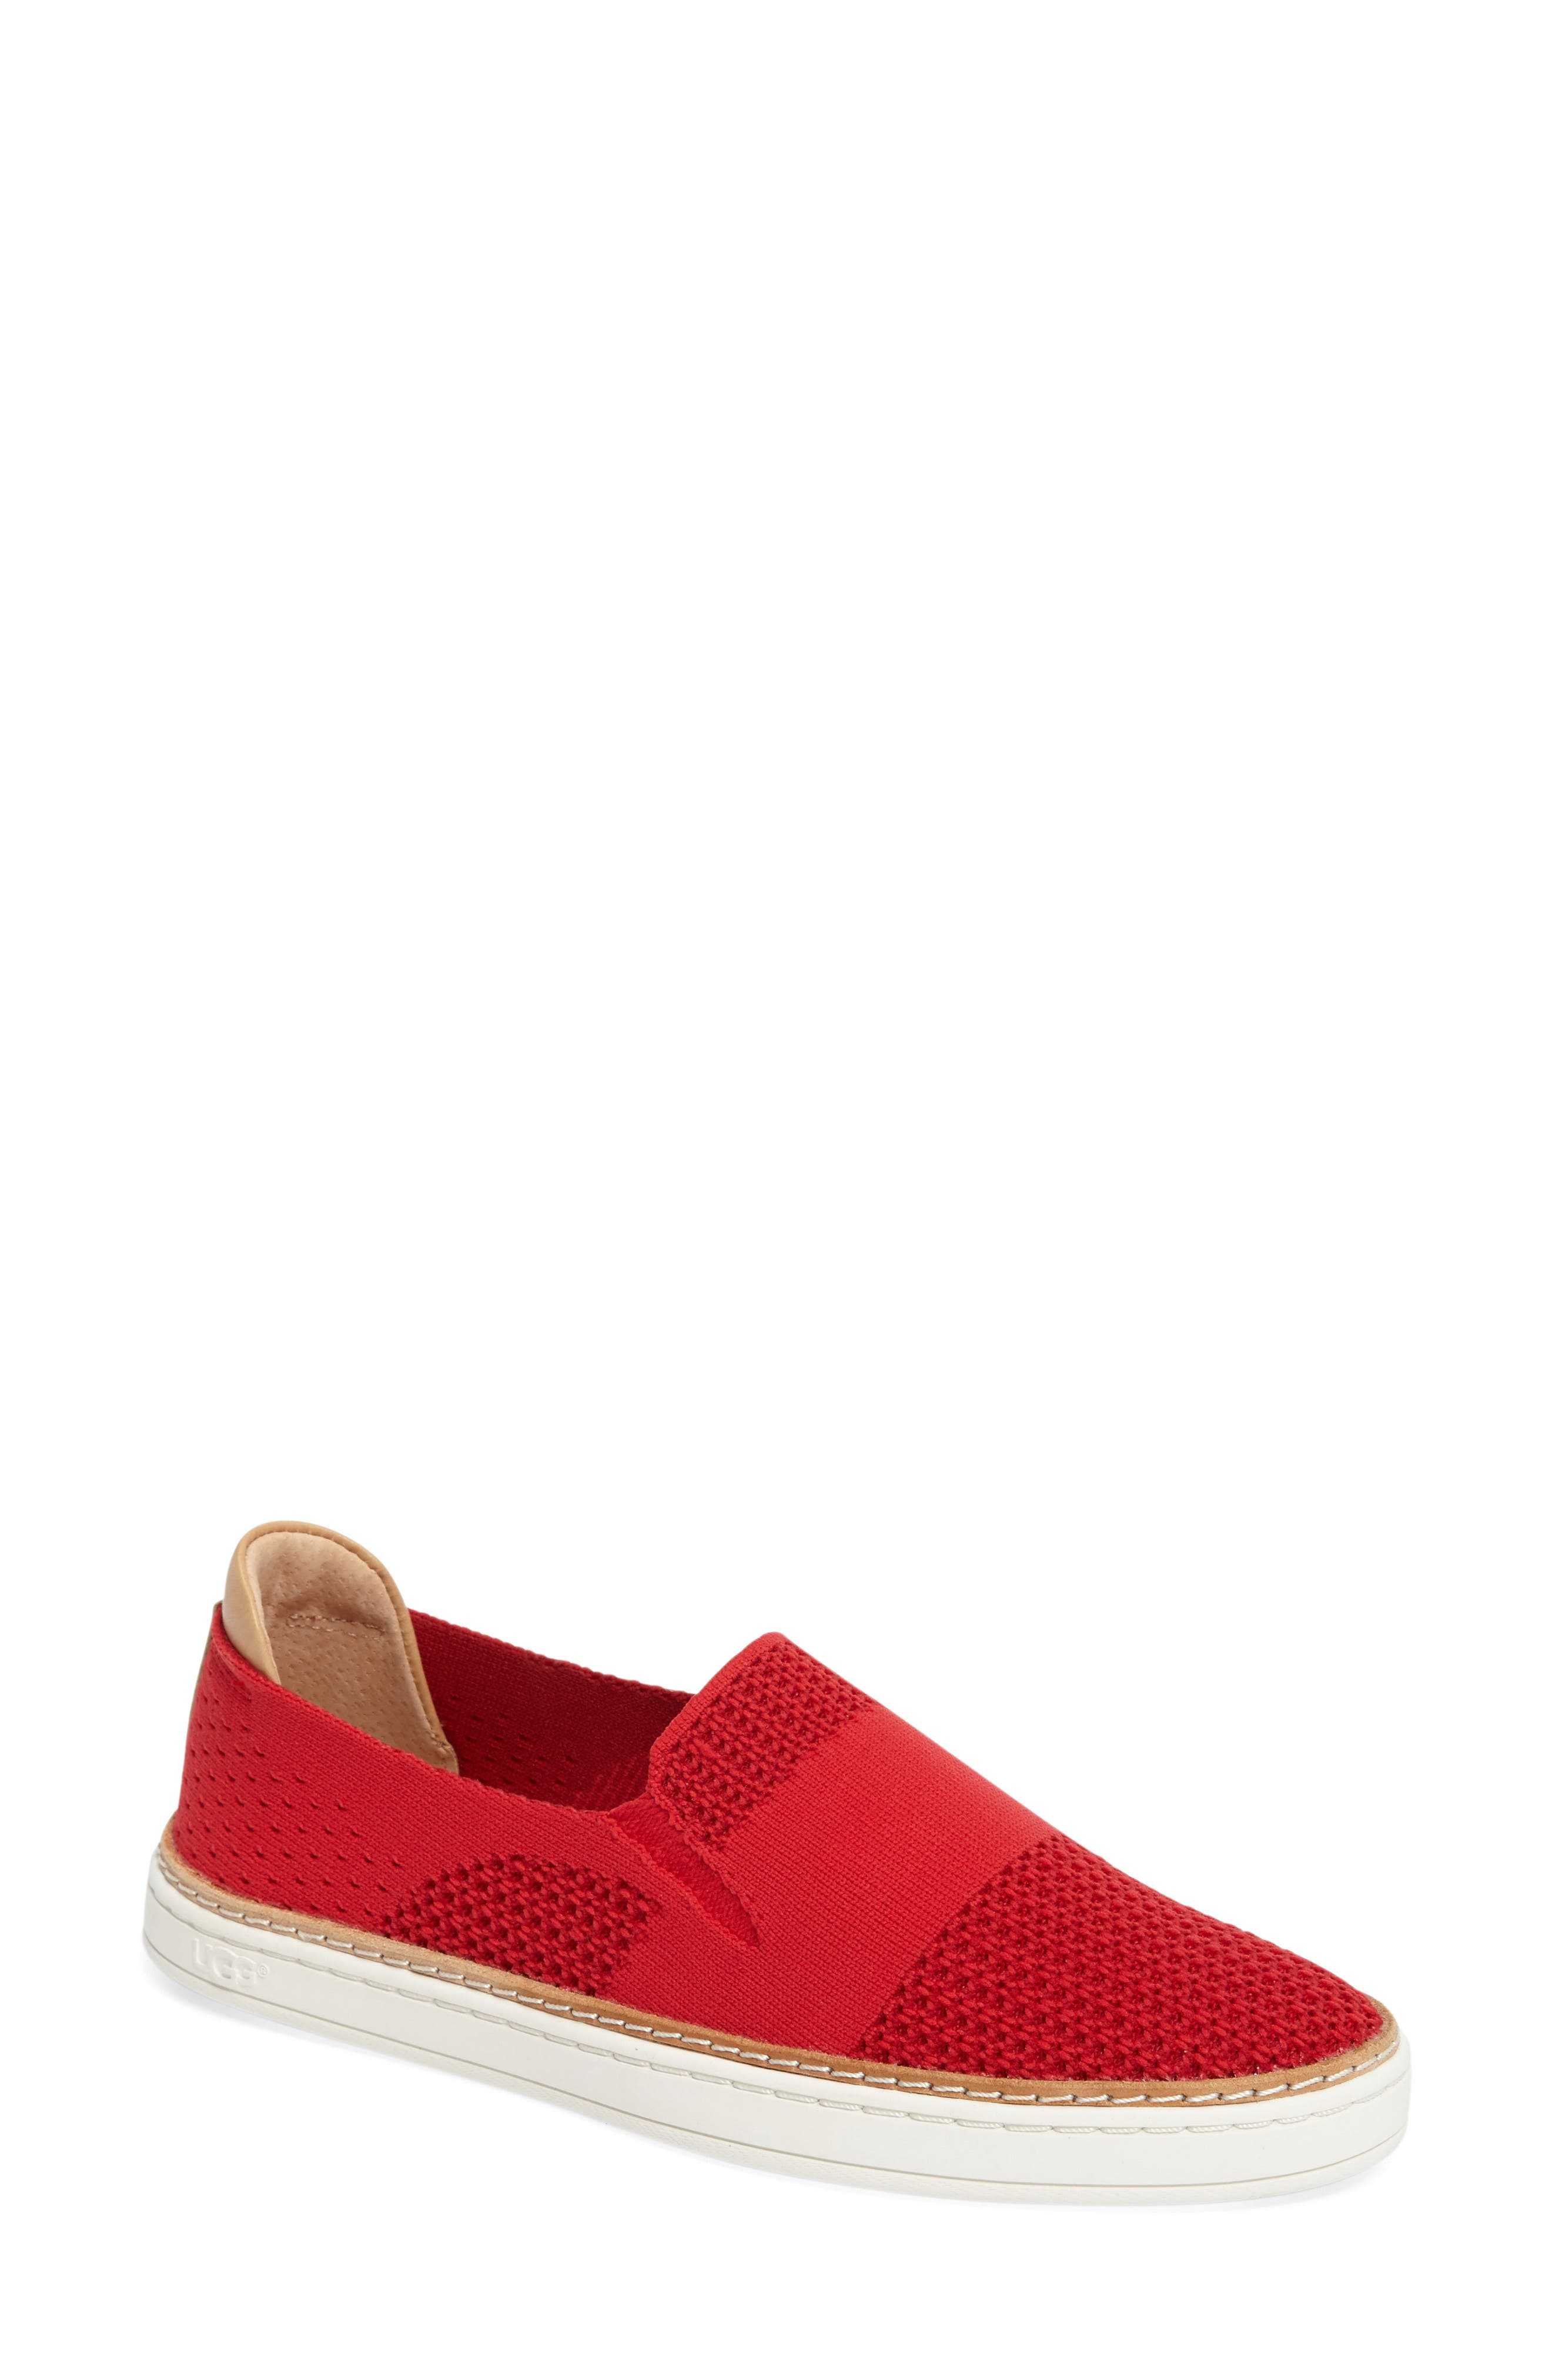 Main Image - UGG® Sammy Sneaker (Women)